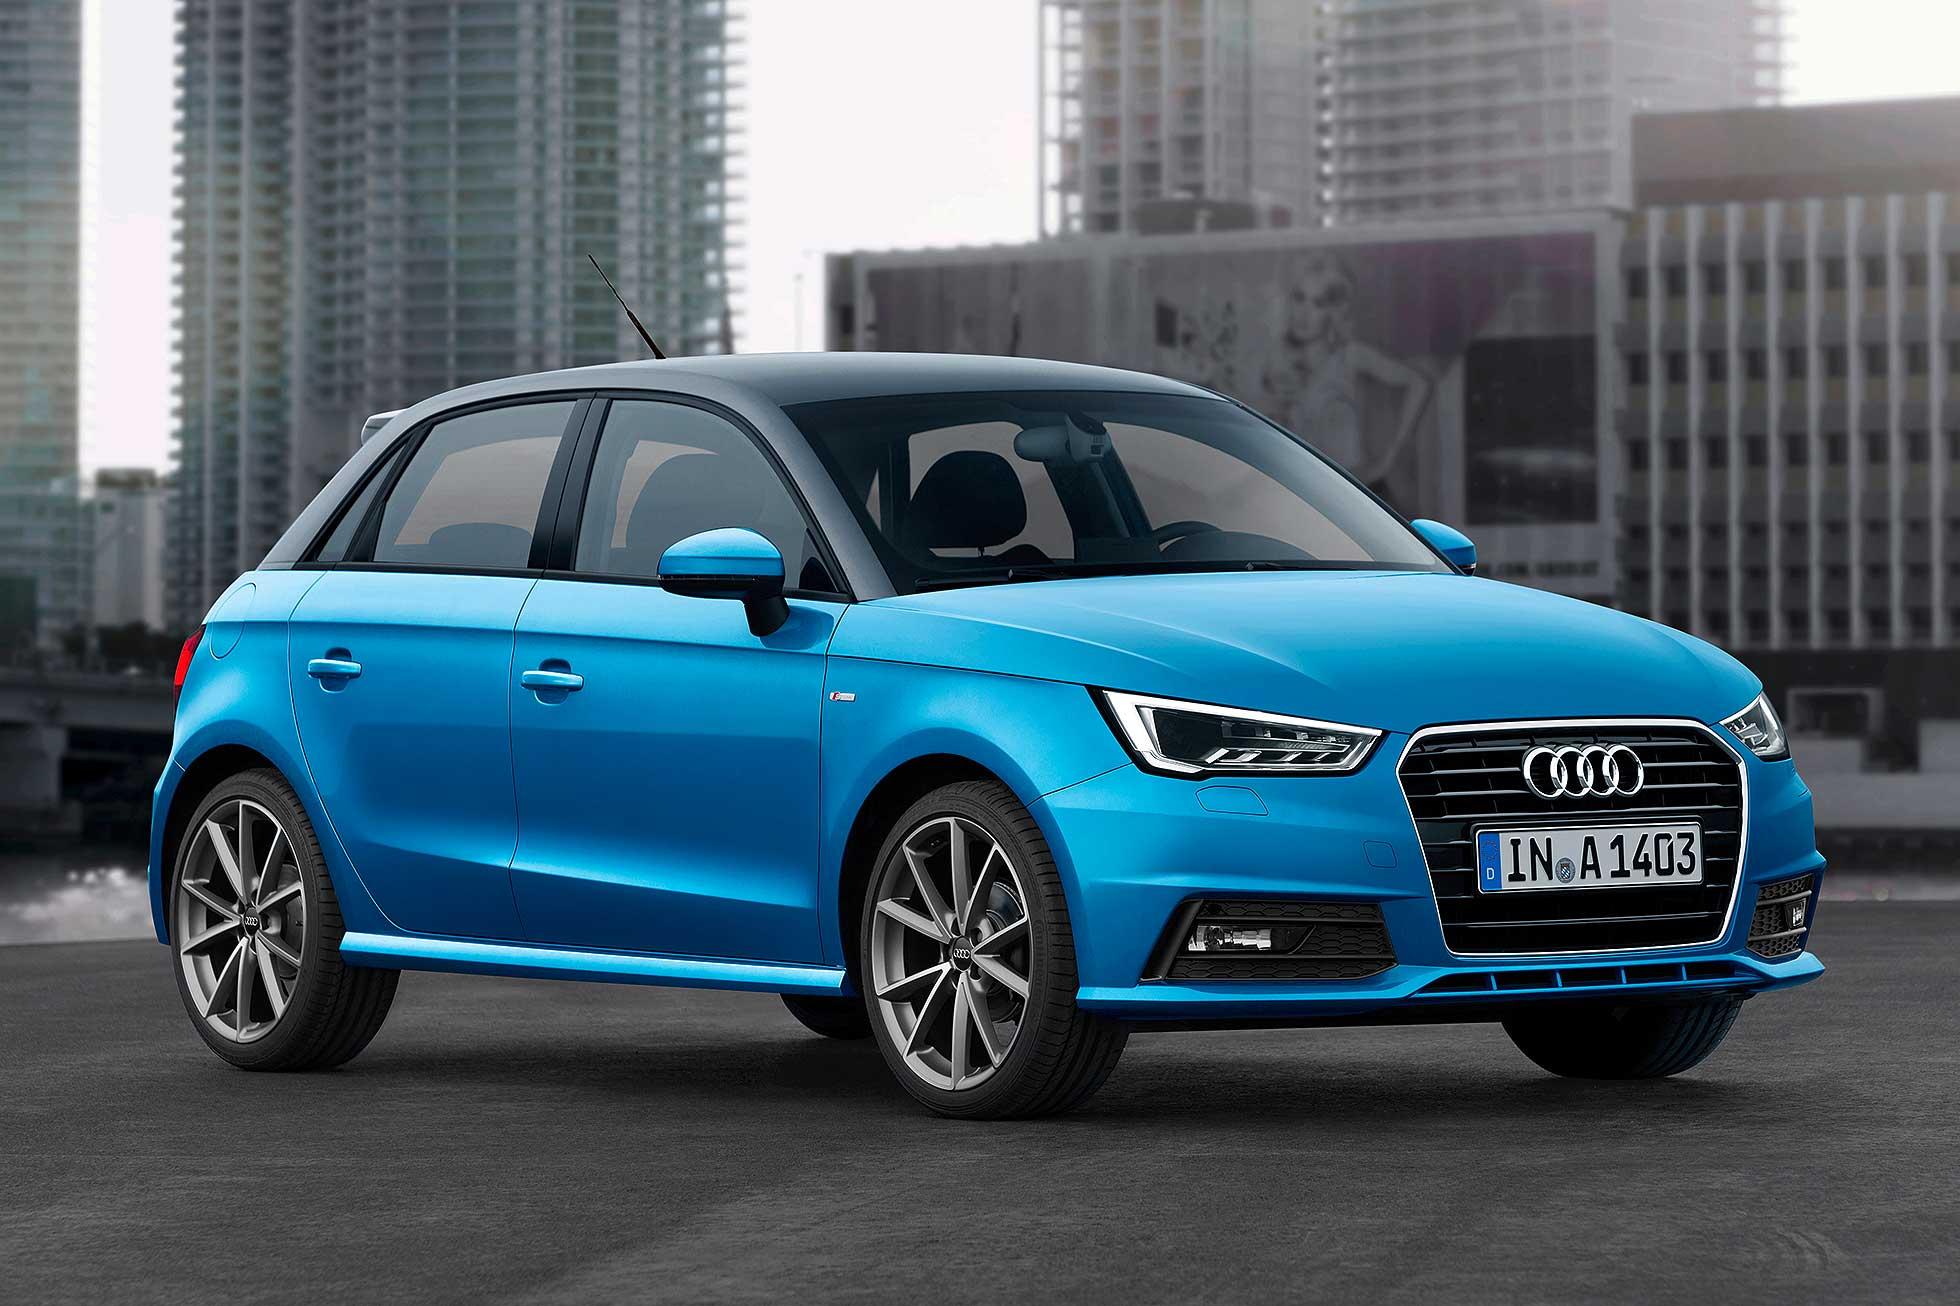 Audi A1 2015 facelift